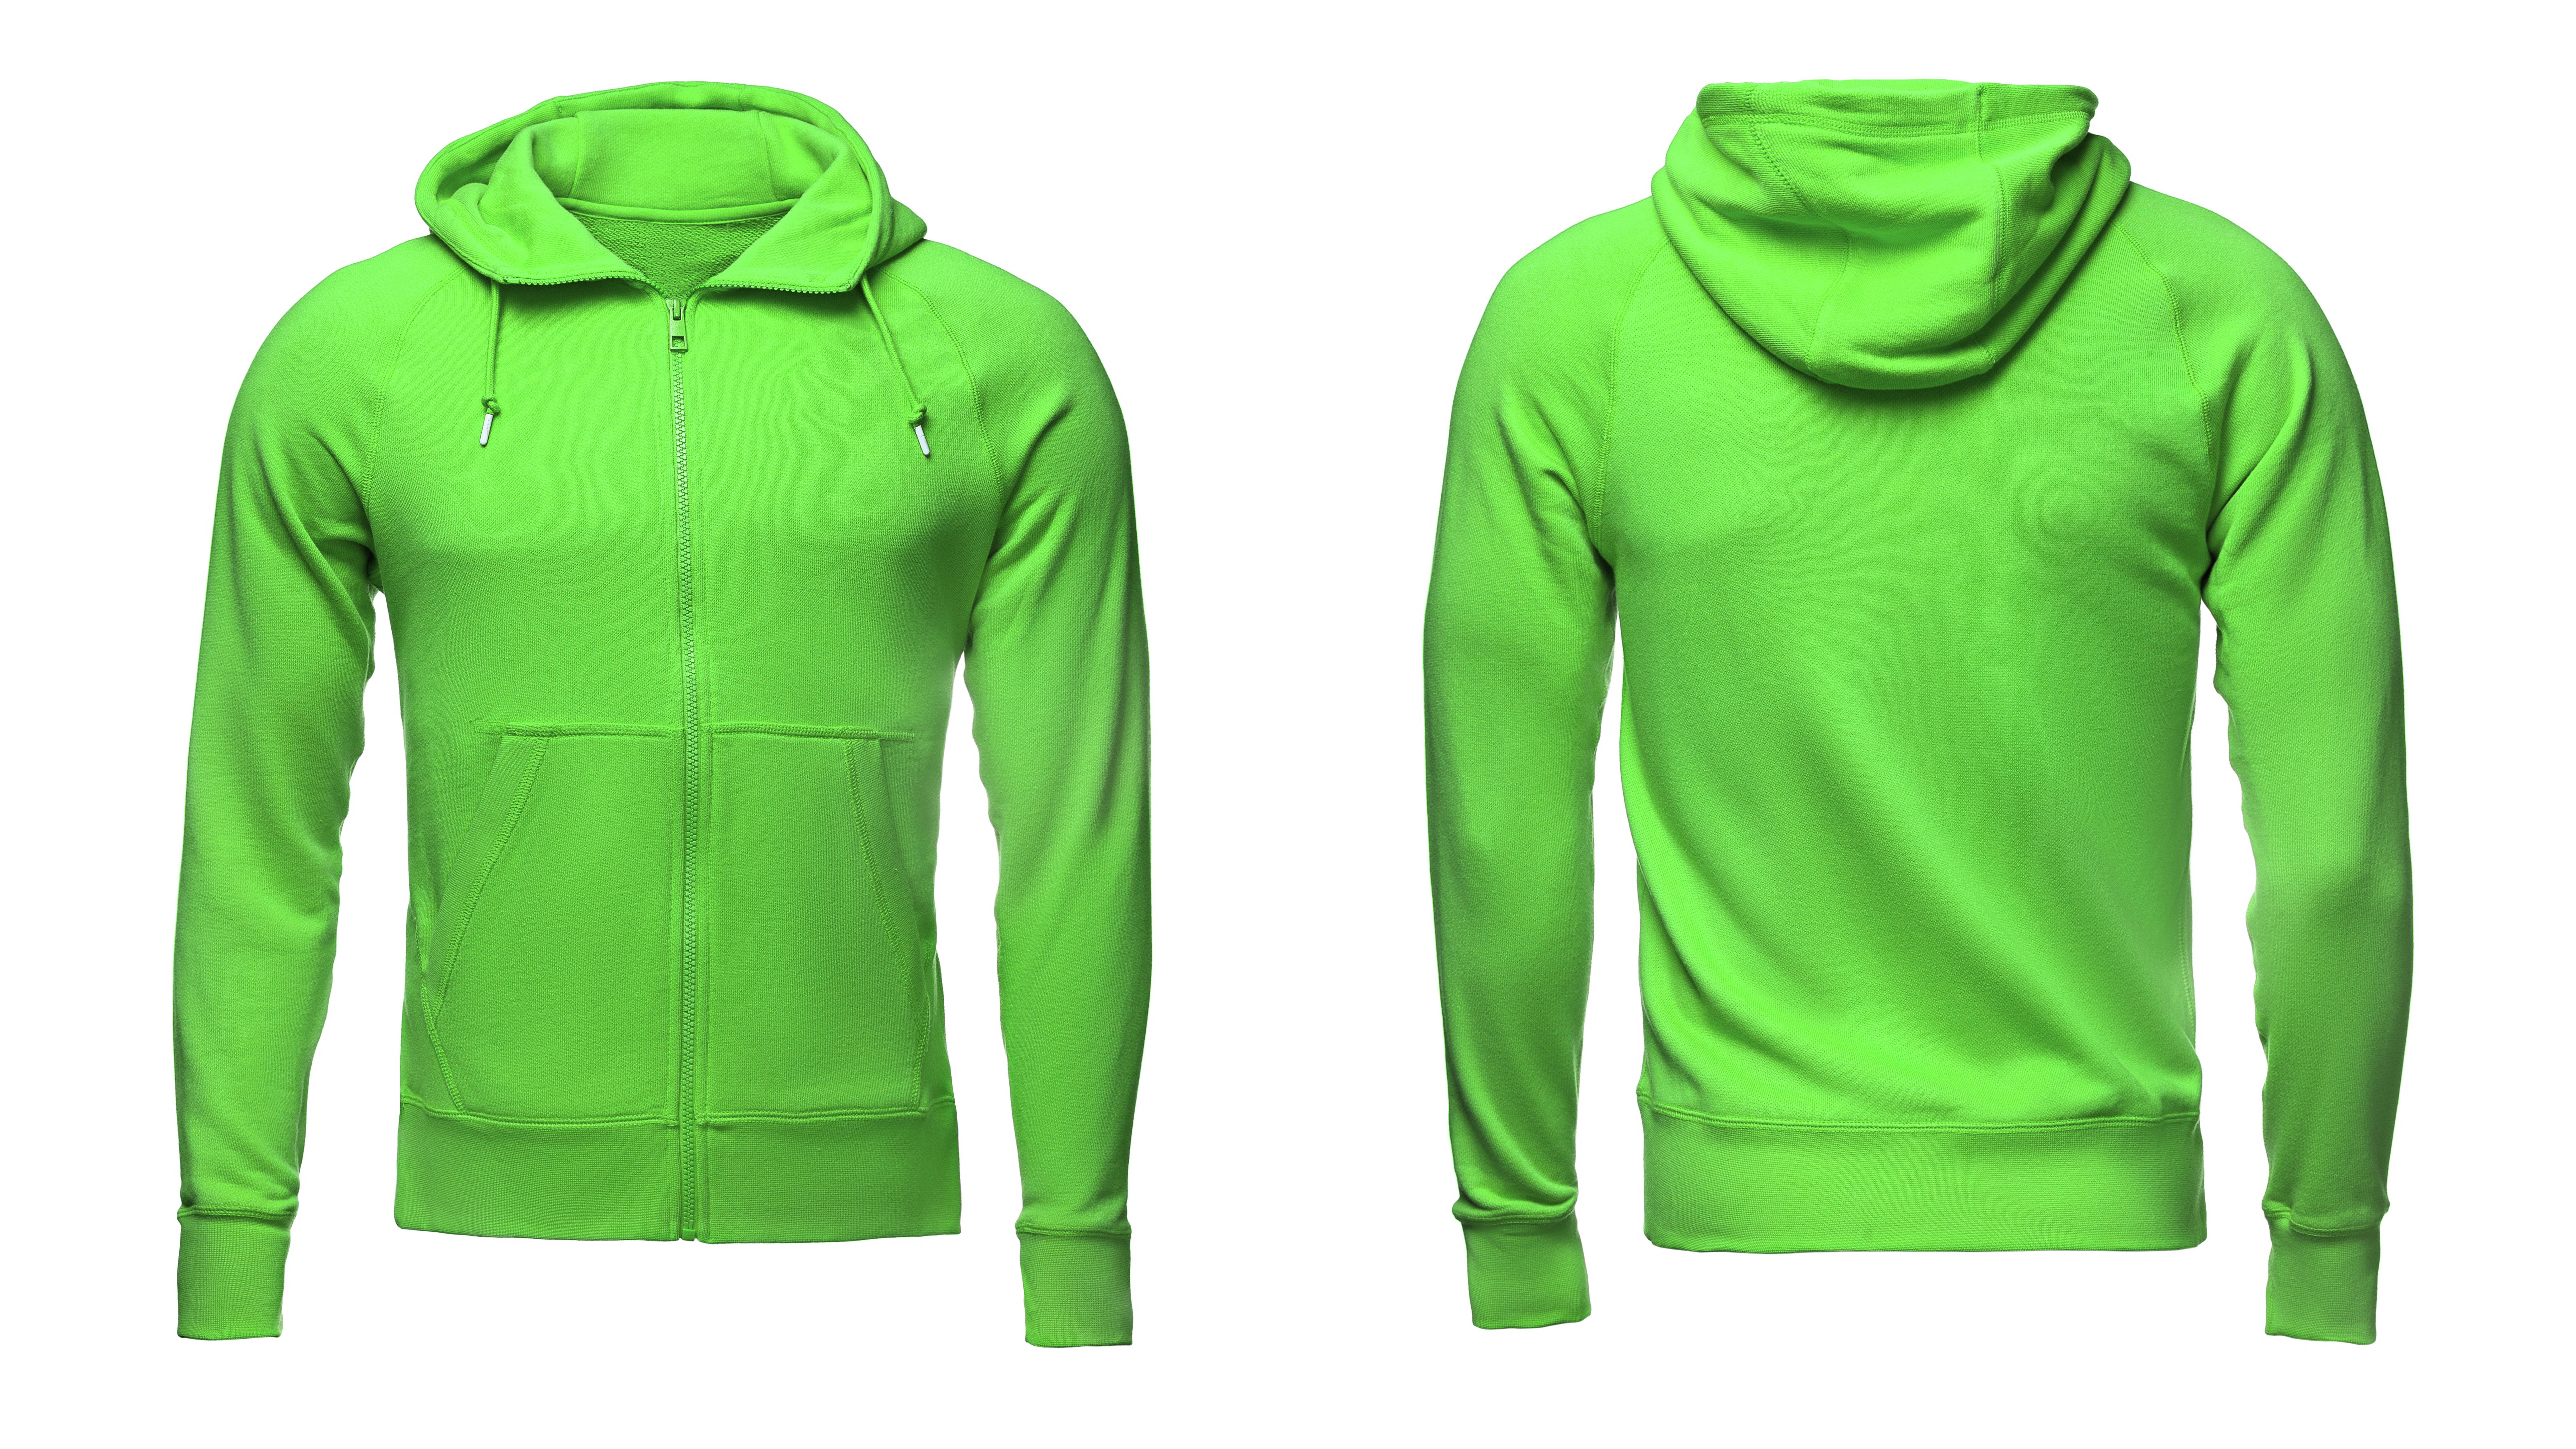 Custom made sweatshirts with hood (12)